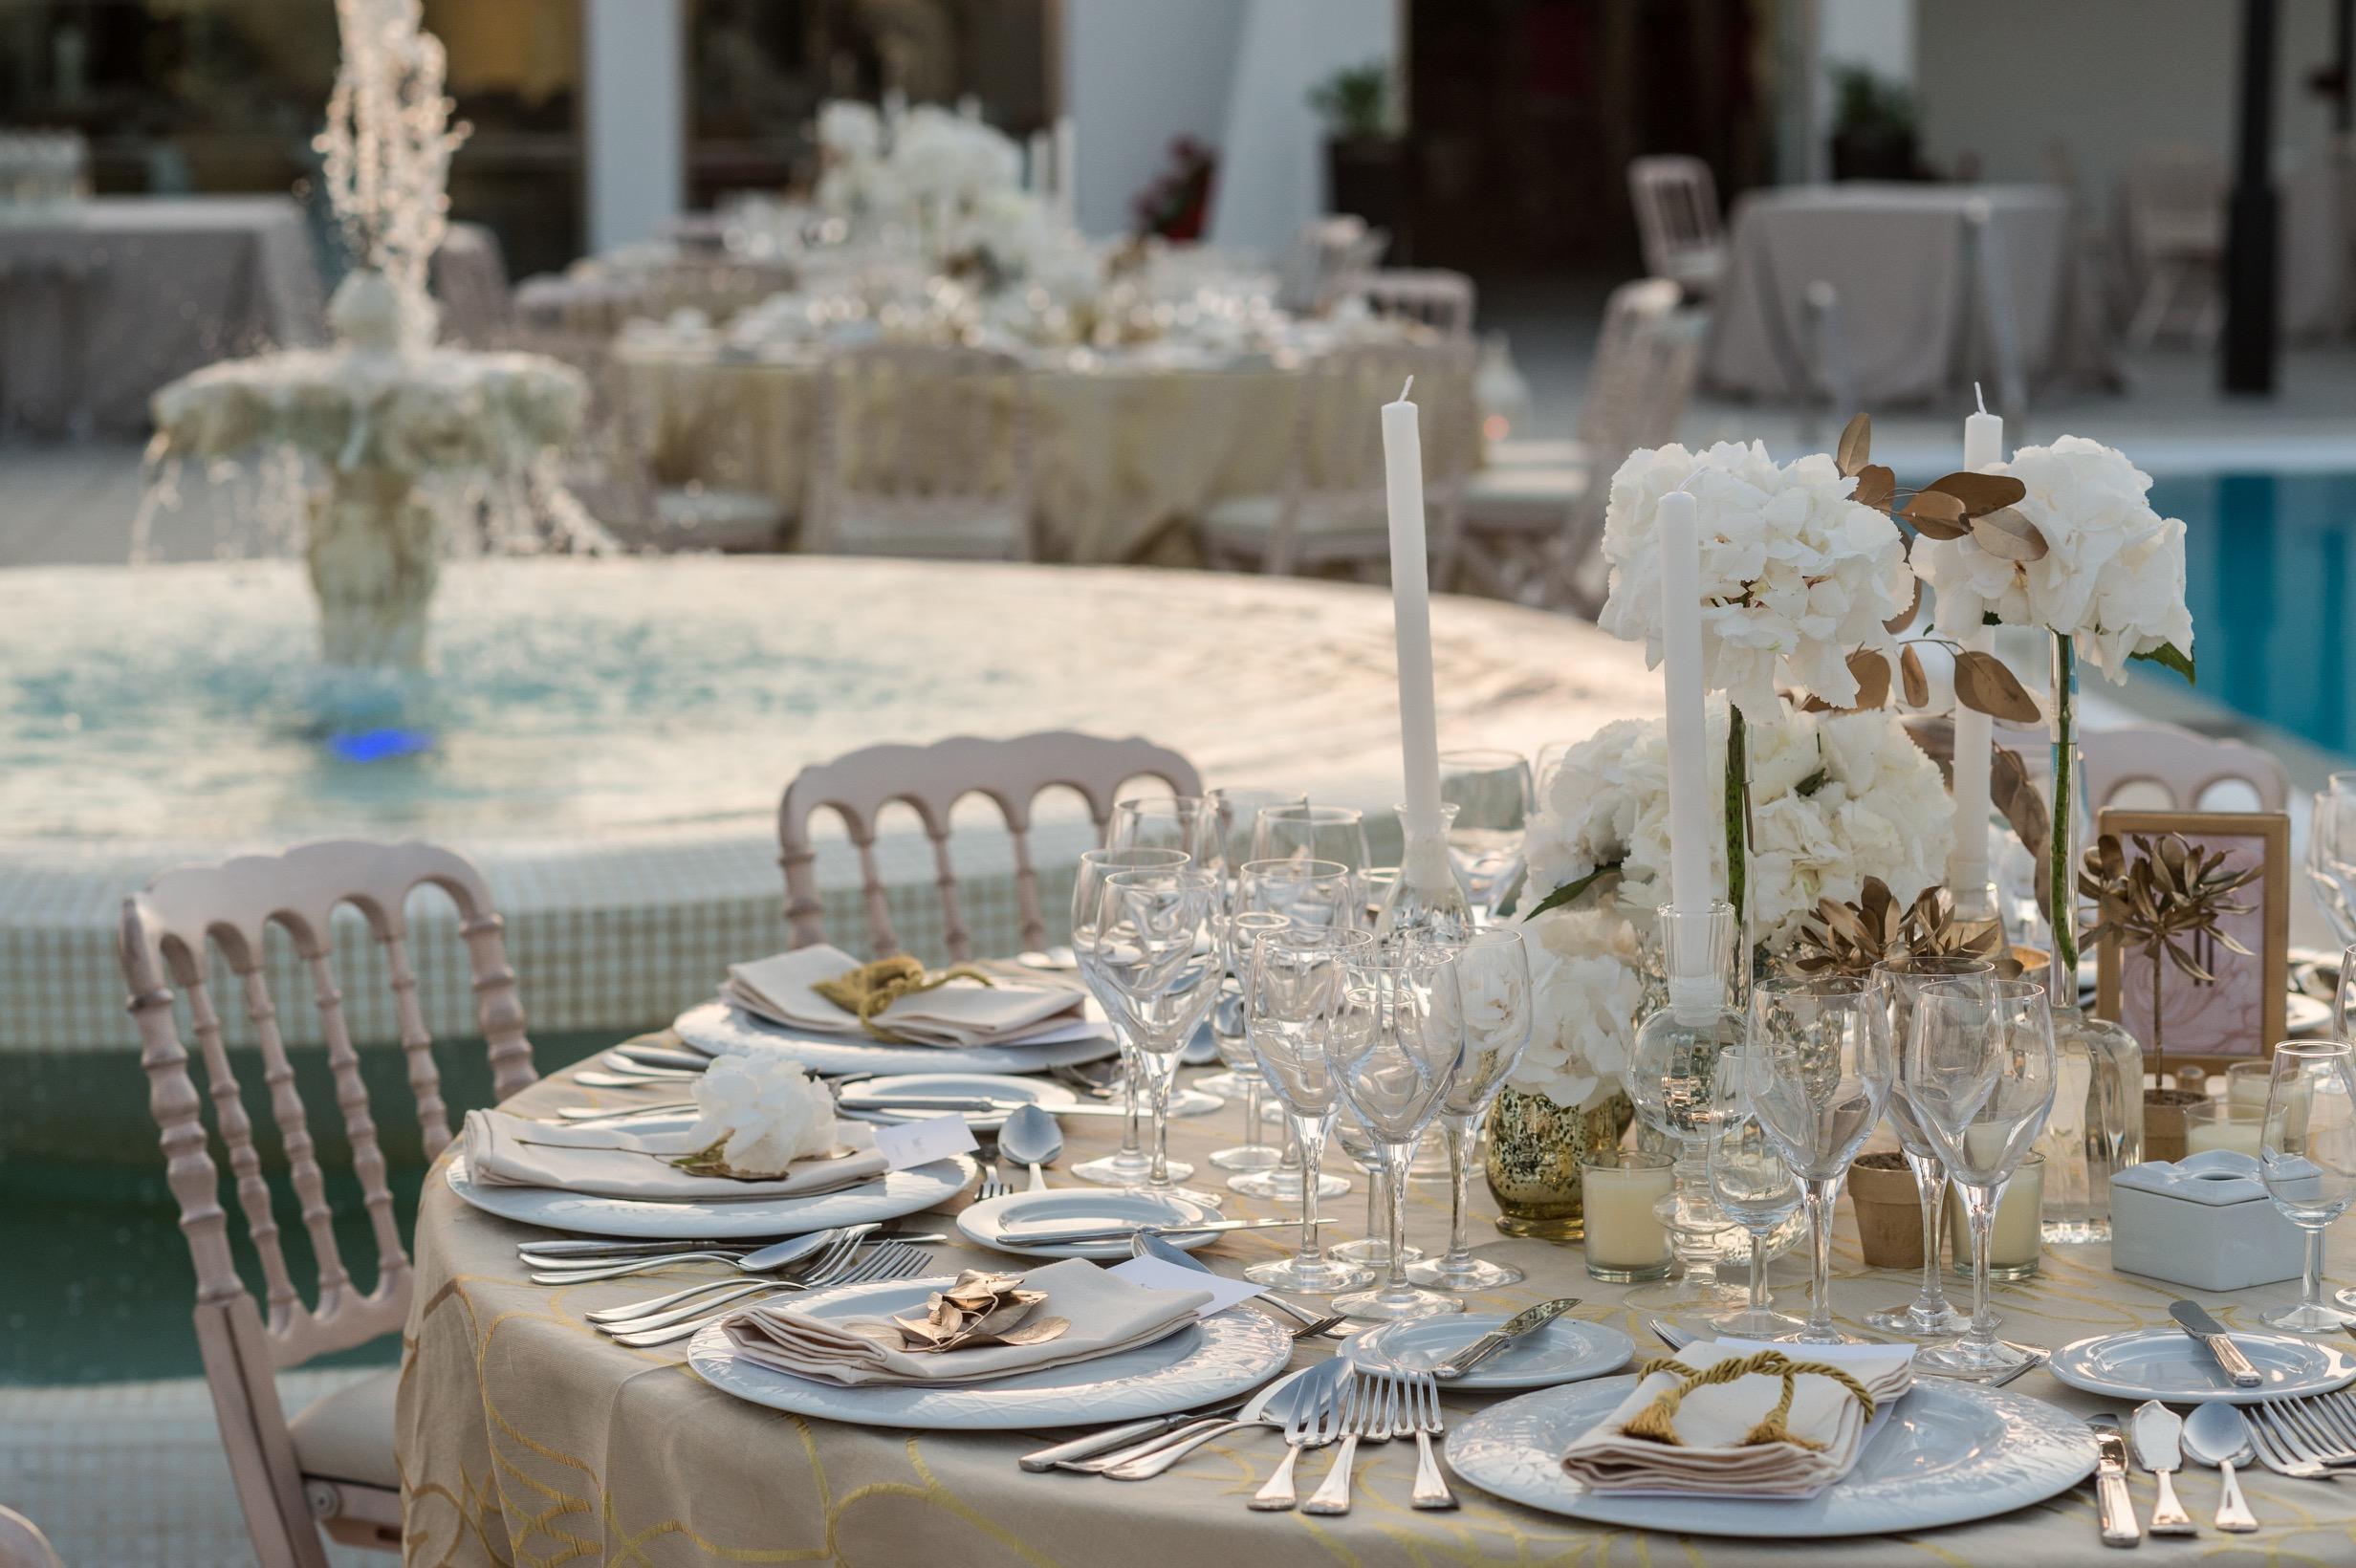 Si-Quiero-Wedding-Planner-By-Sira-Antequera-Bodas-Málaga-Marbella-Miami- Sandra-Rafa-14